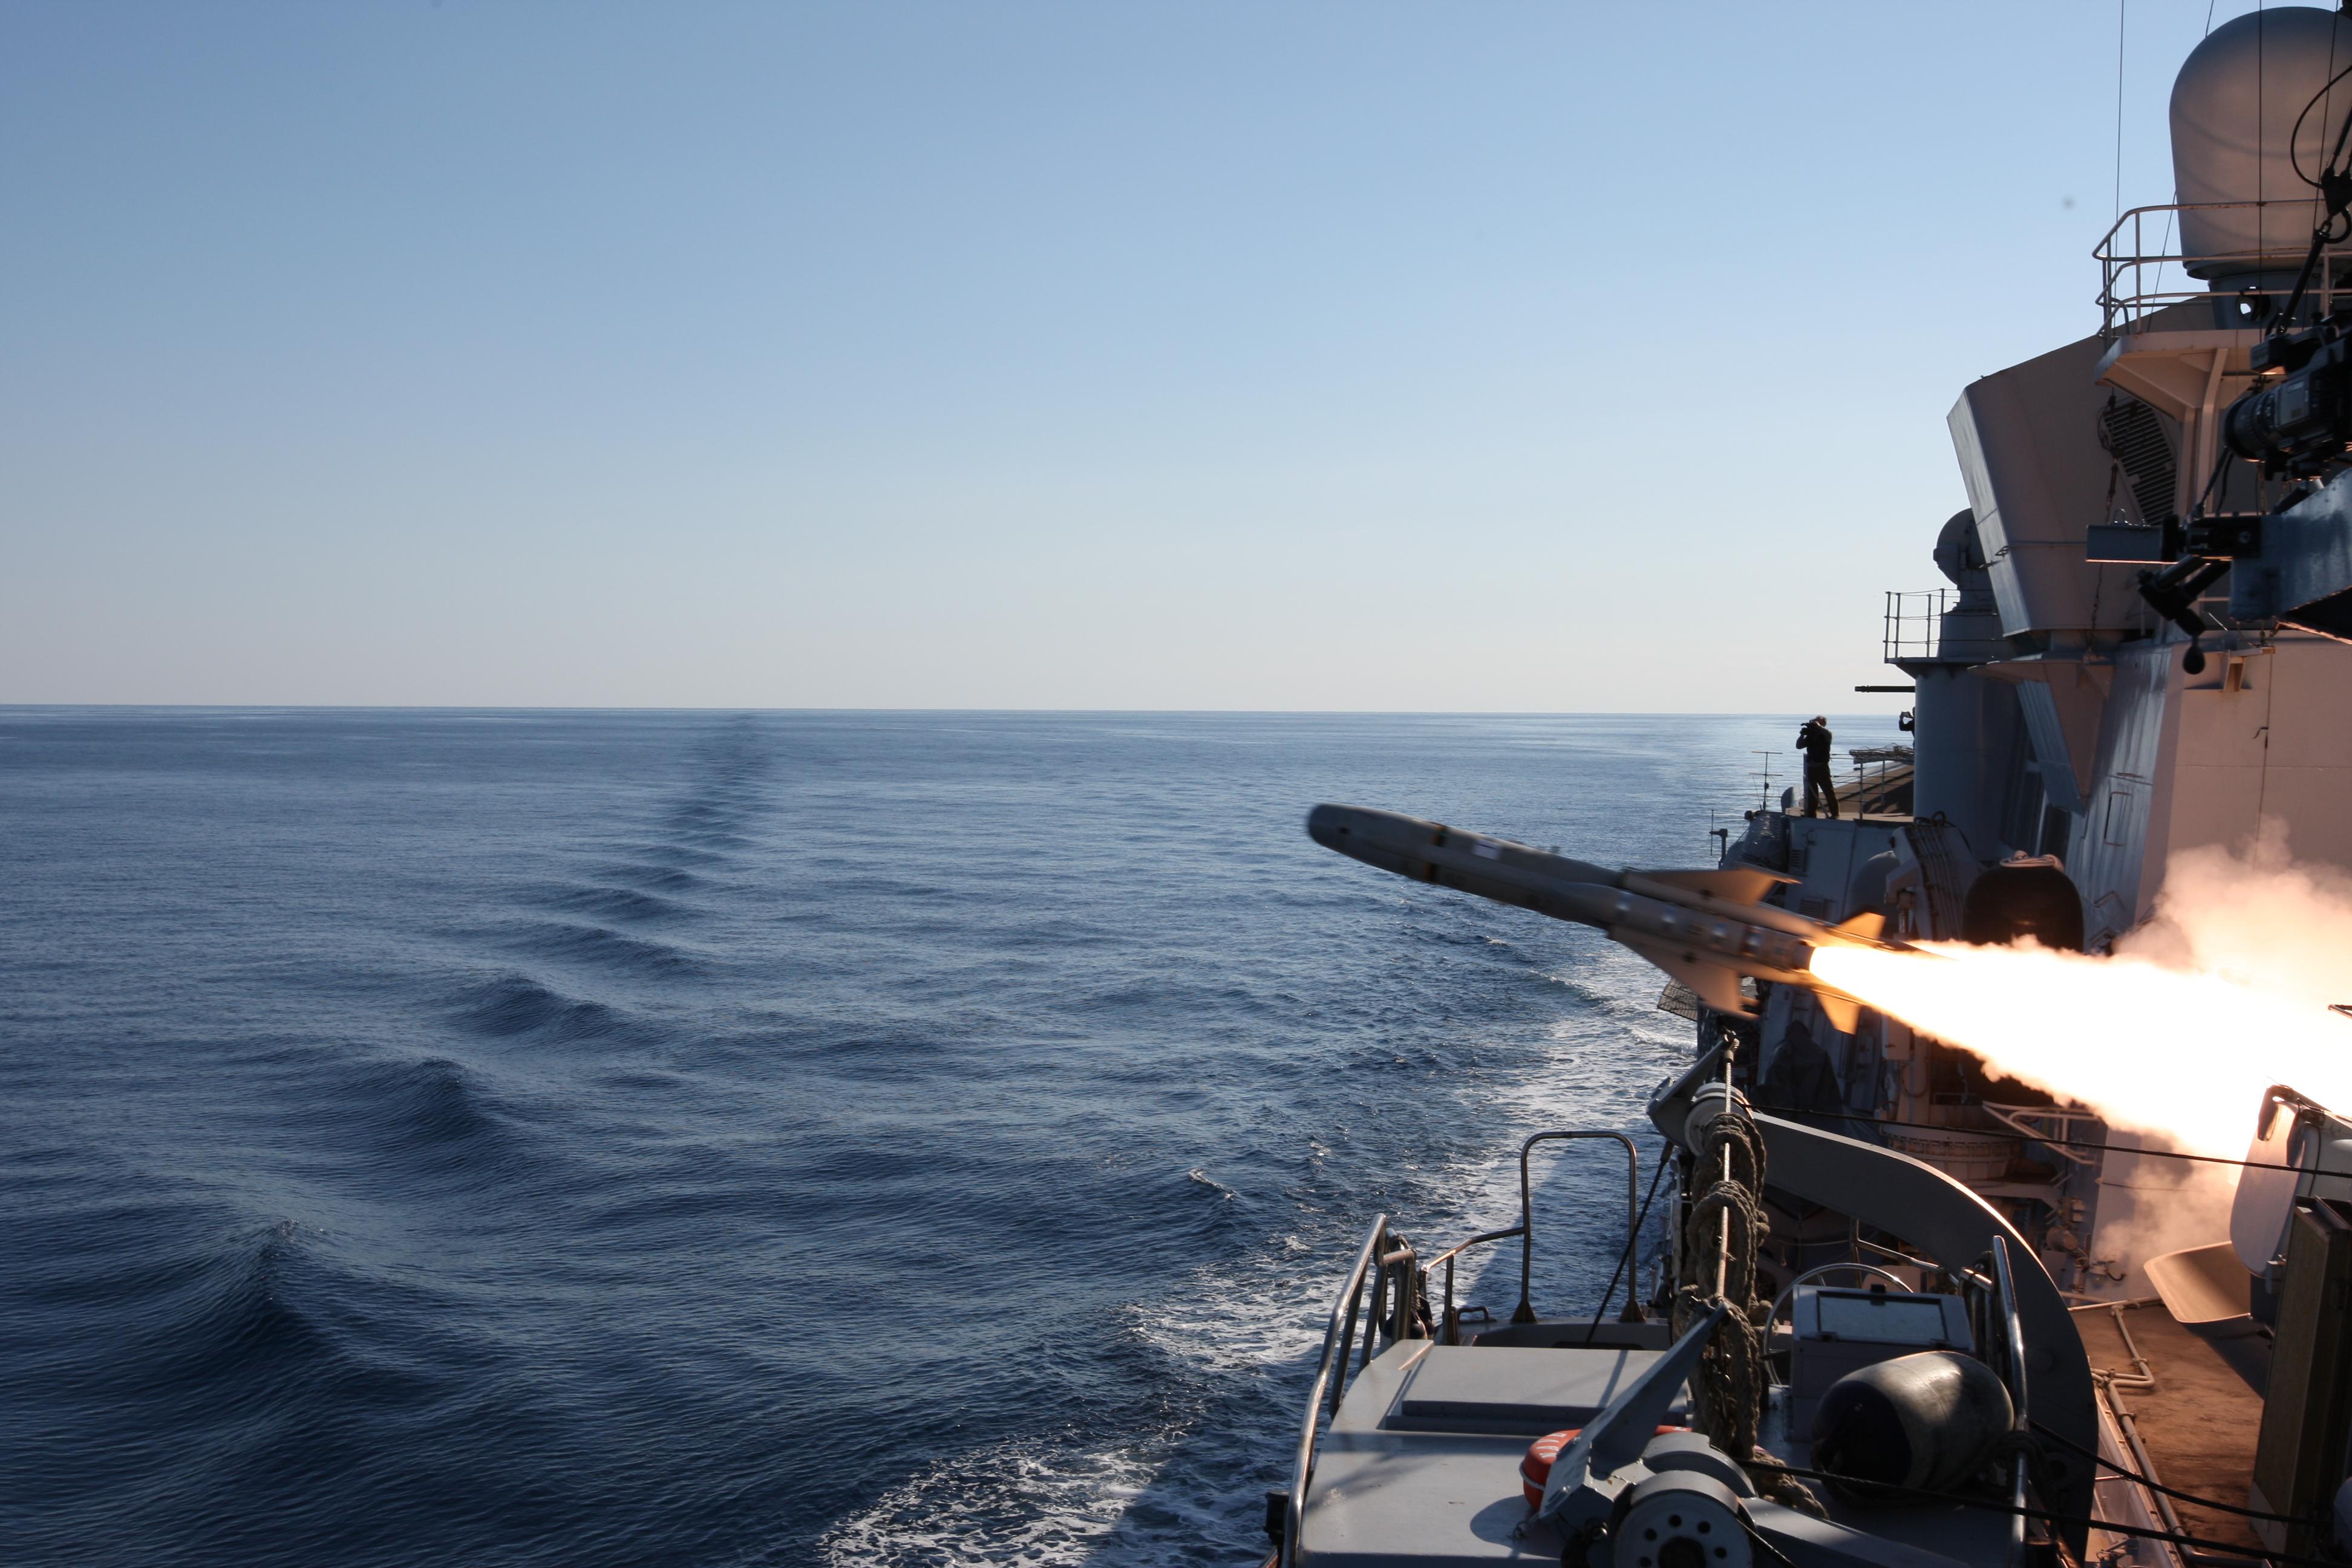 OTOMAT MK2 BLOCK IV firing from Durand de la Penne Destroyer